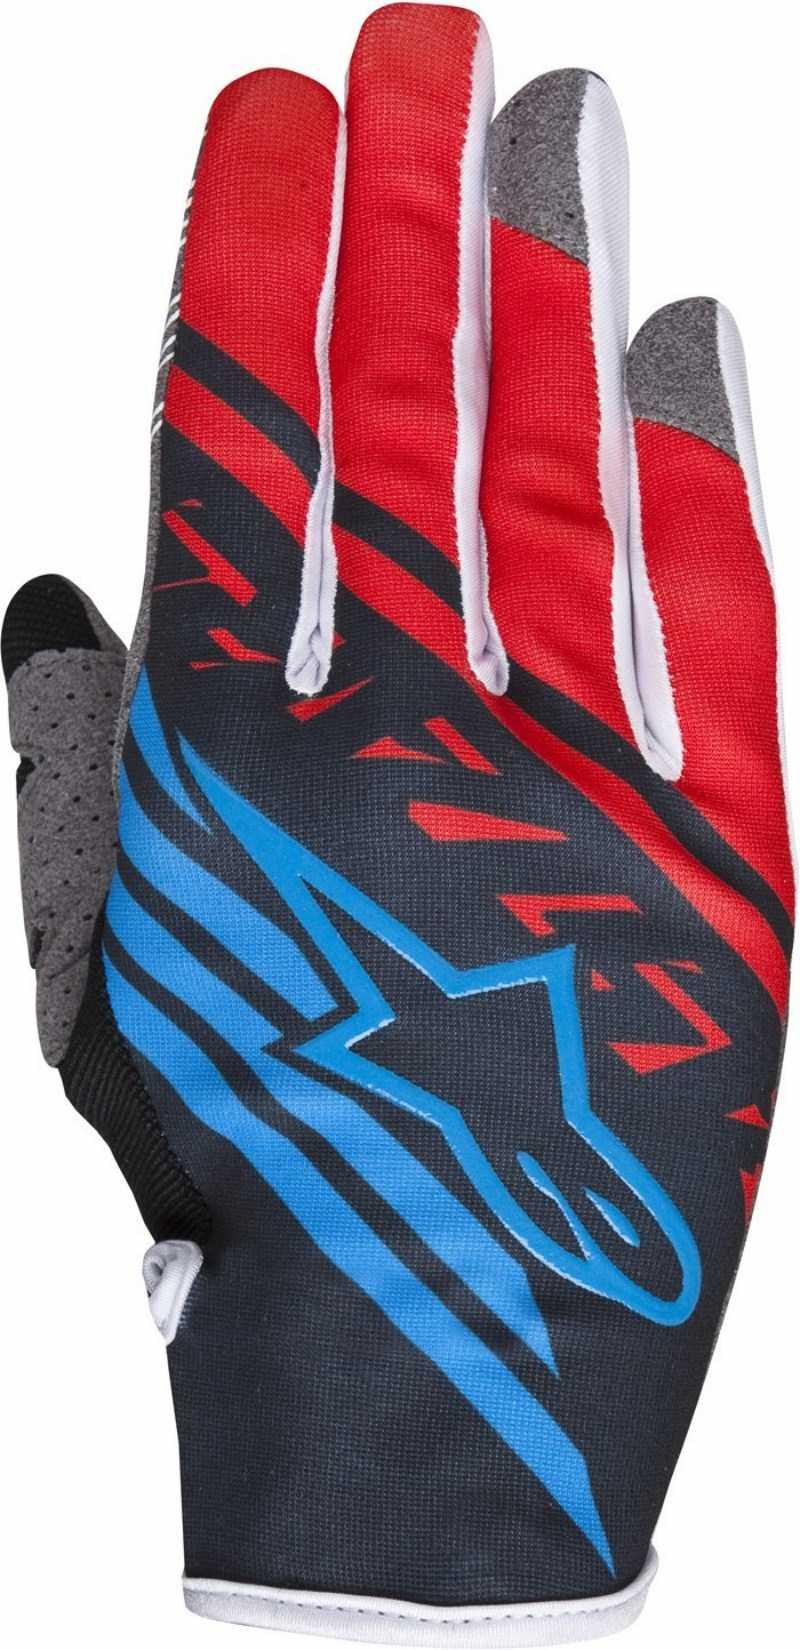 Alpinestars Youth Racer Supermatic cross gloves Black Red